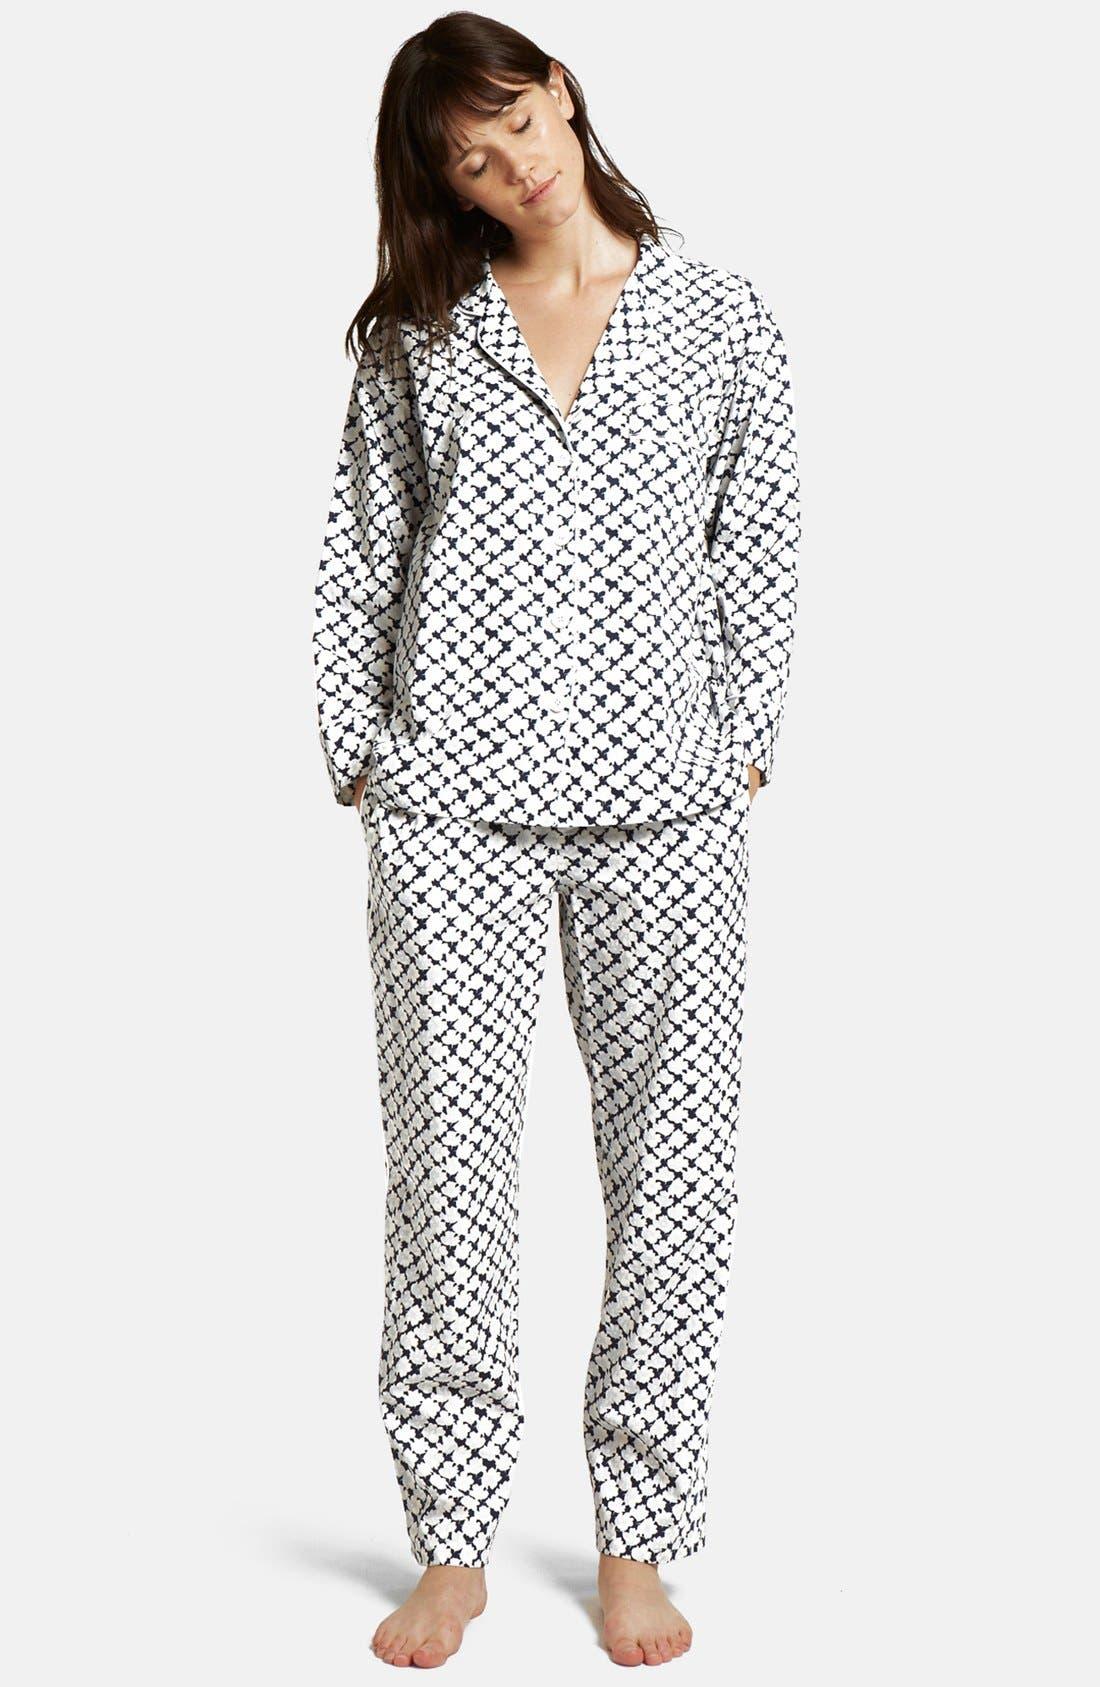 SLEEPY JONES,                             'Marina' Pajama Pants,                             Alternate thumbnail 2, color,                             415